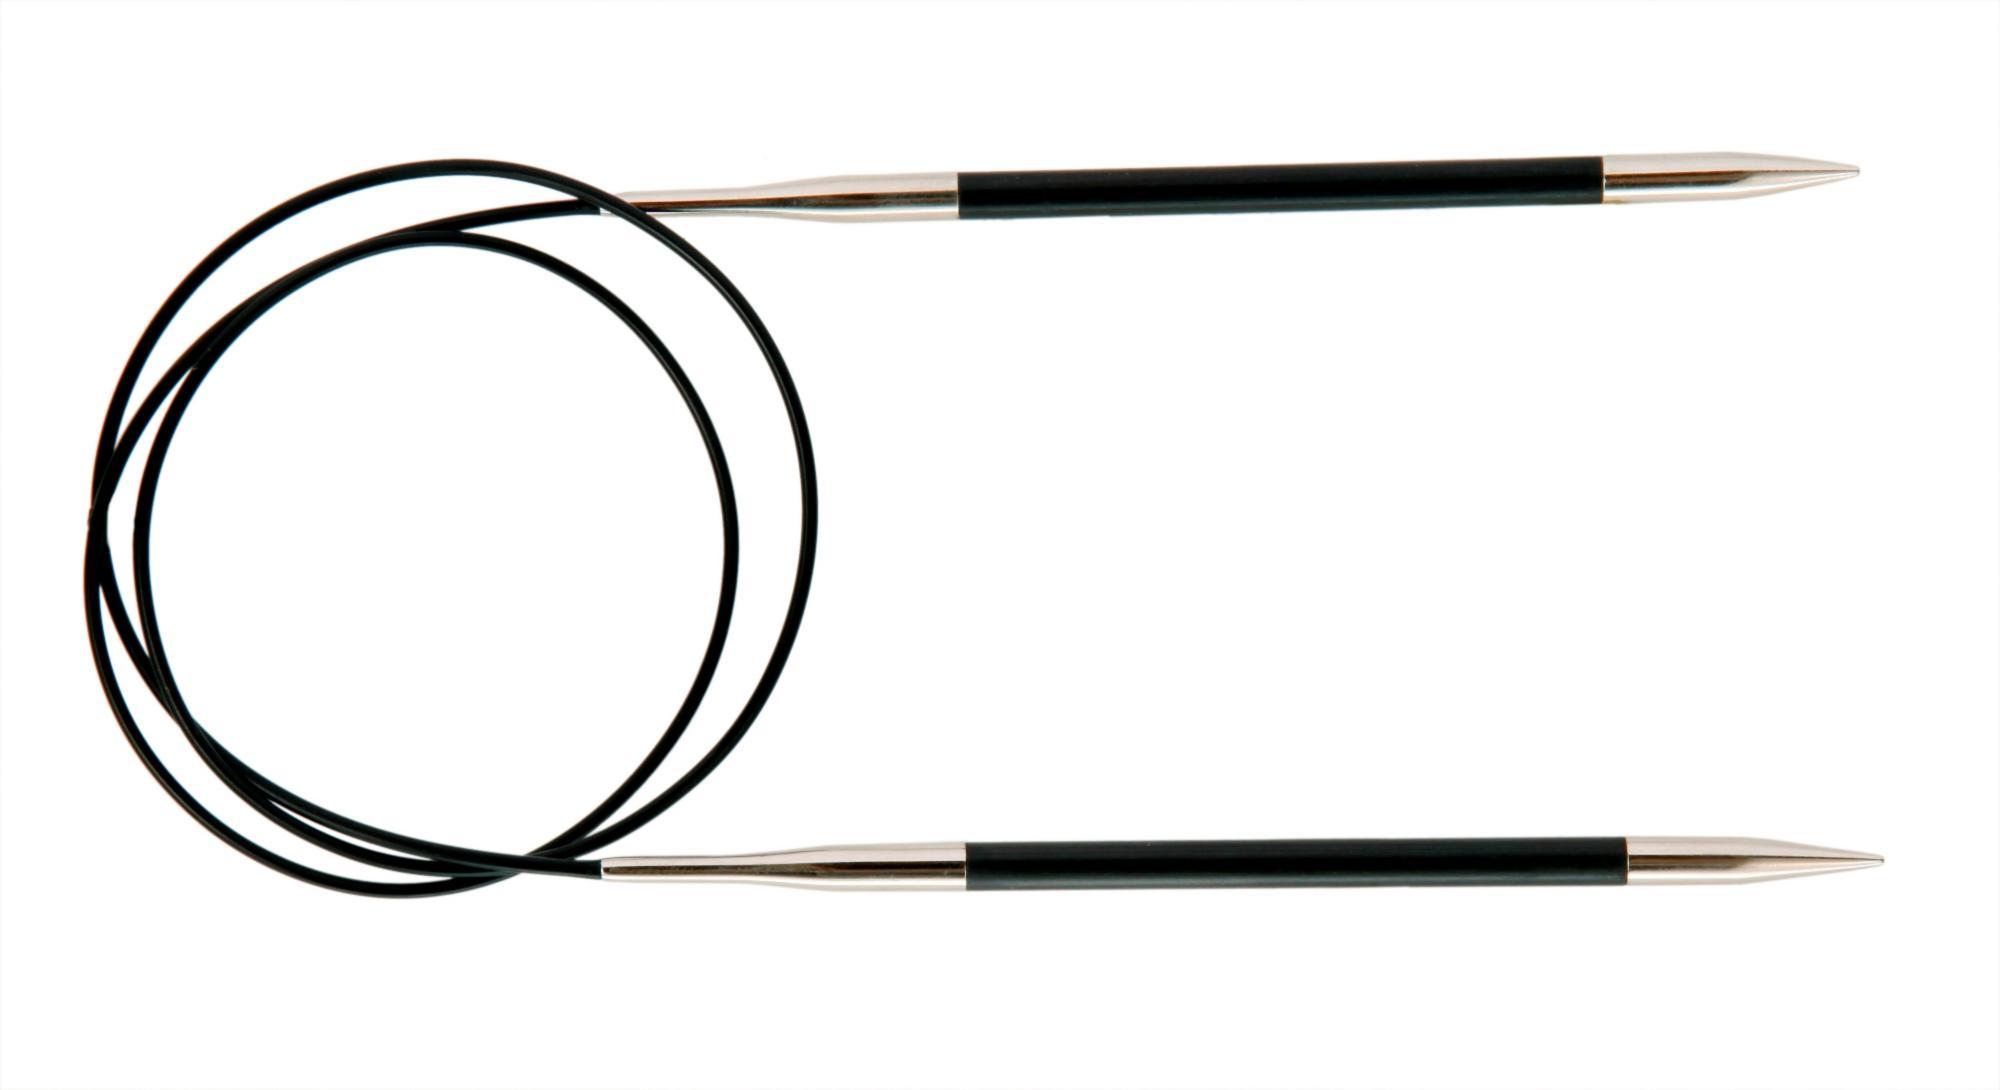 Спицы круговые 40 см Karbonz KnitPro, 41150, 5.00 мм